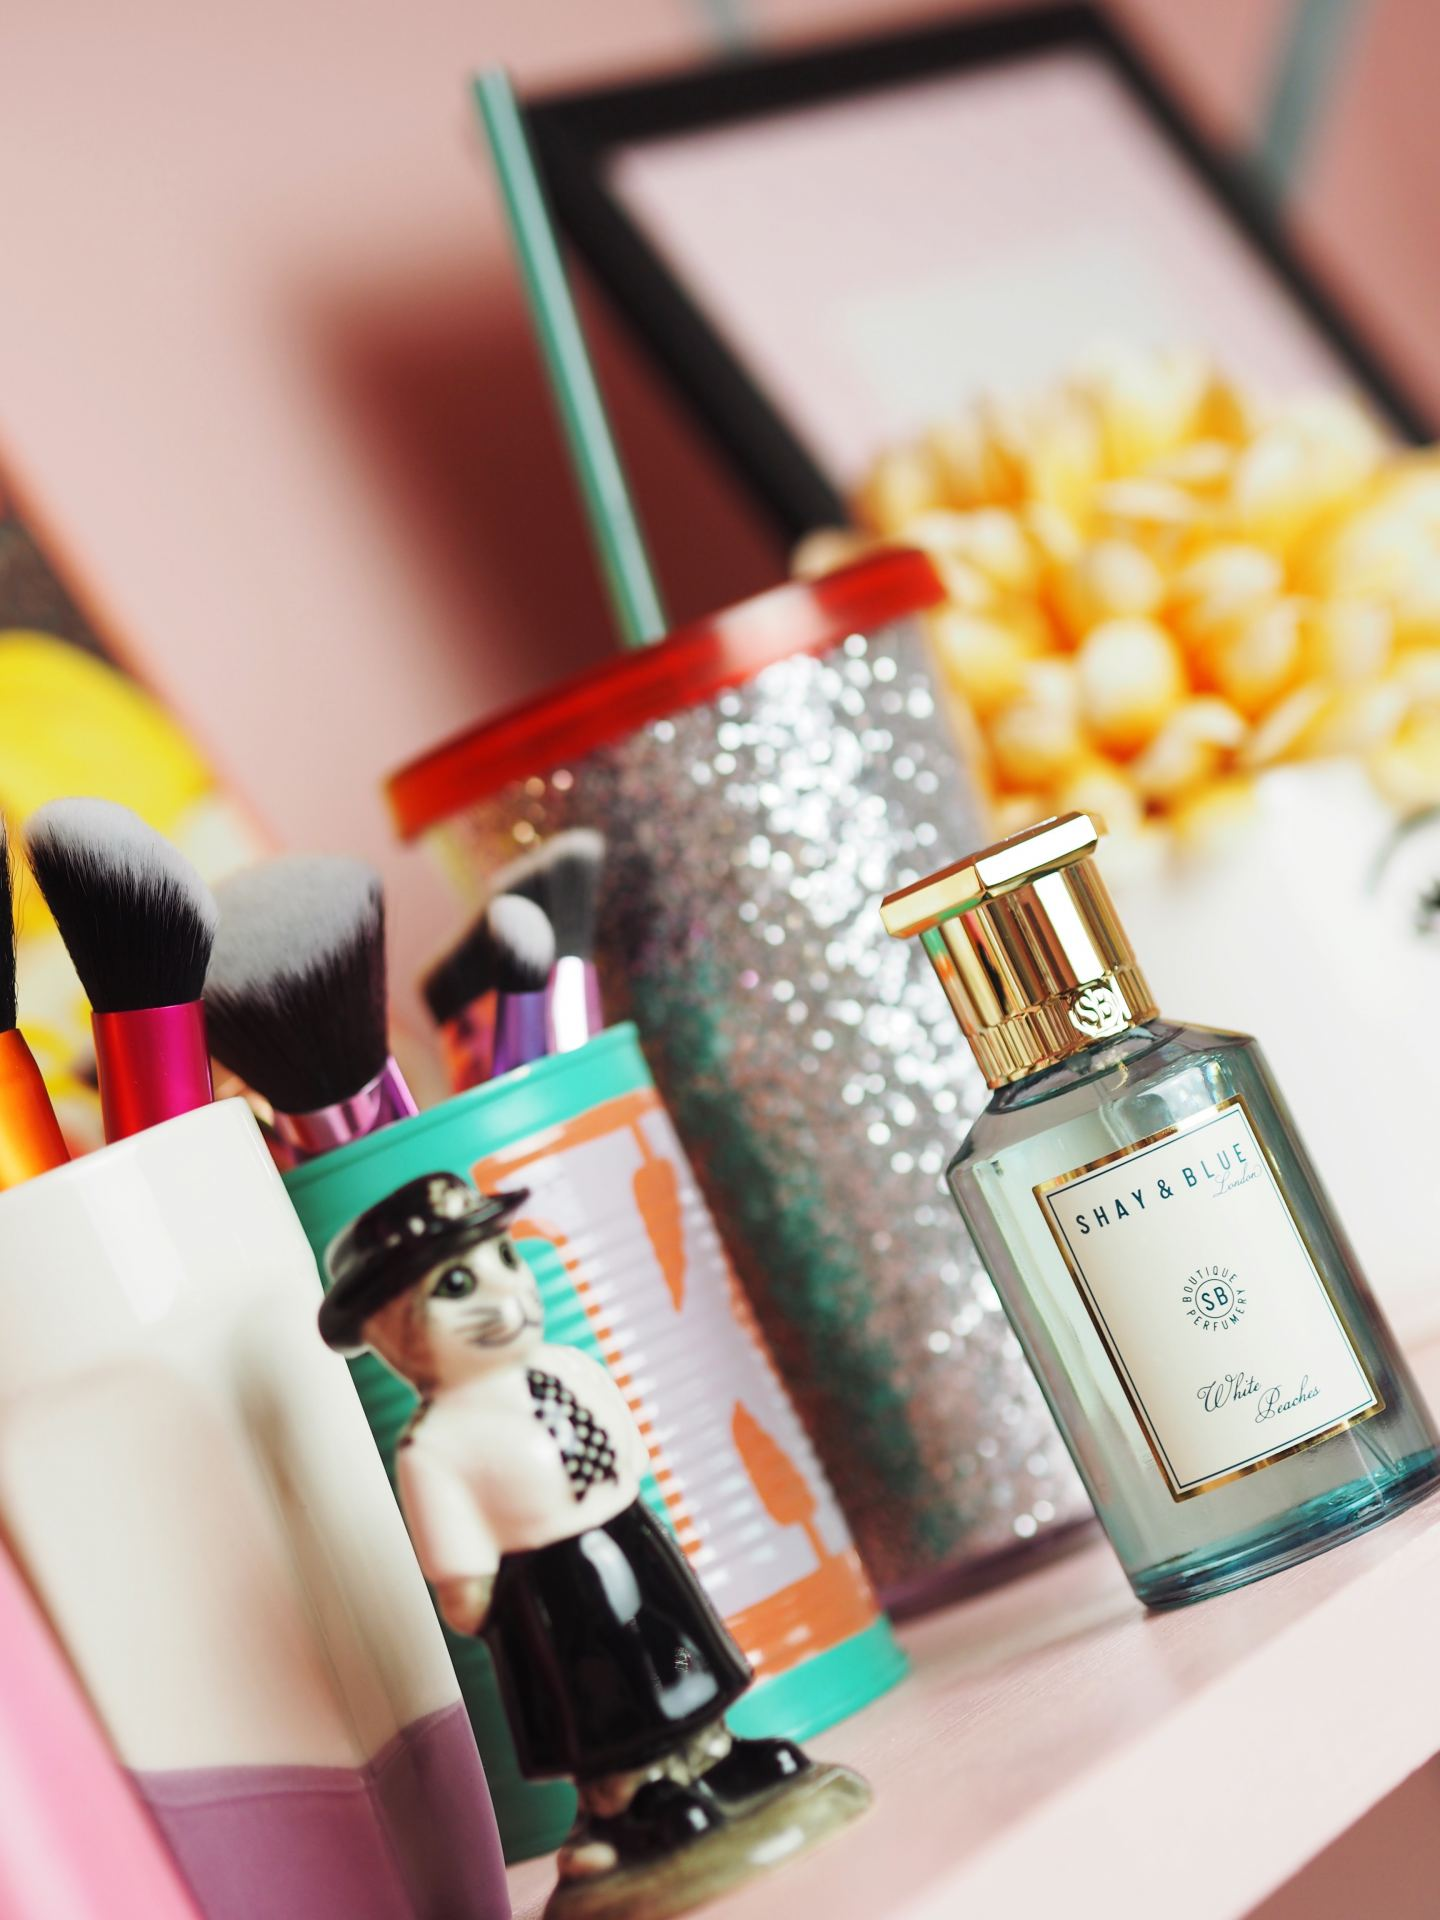 Shay & Blue 'White Peaches' review perfume fragrance